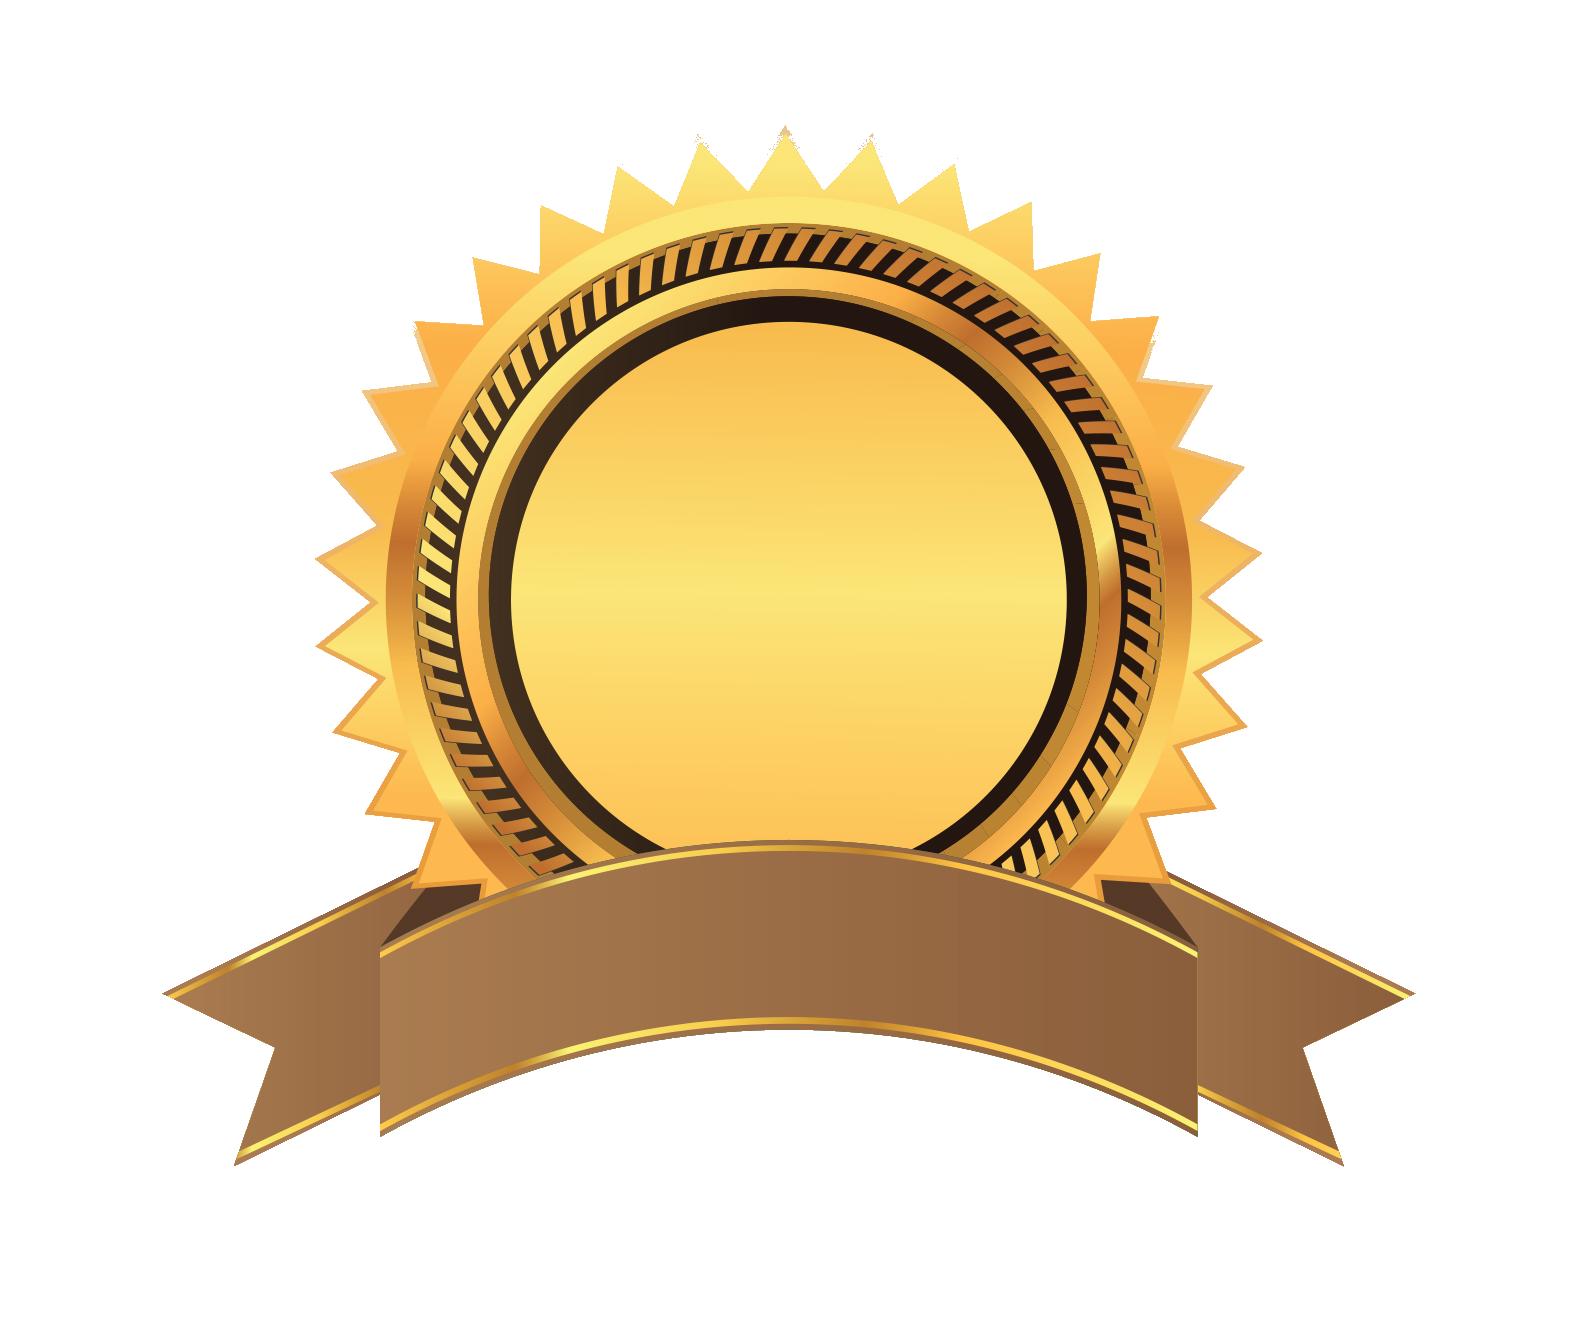 Award Clipart Png.